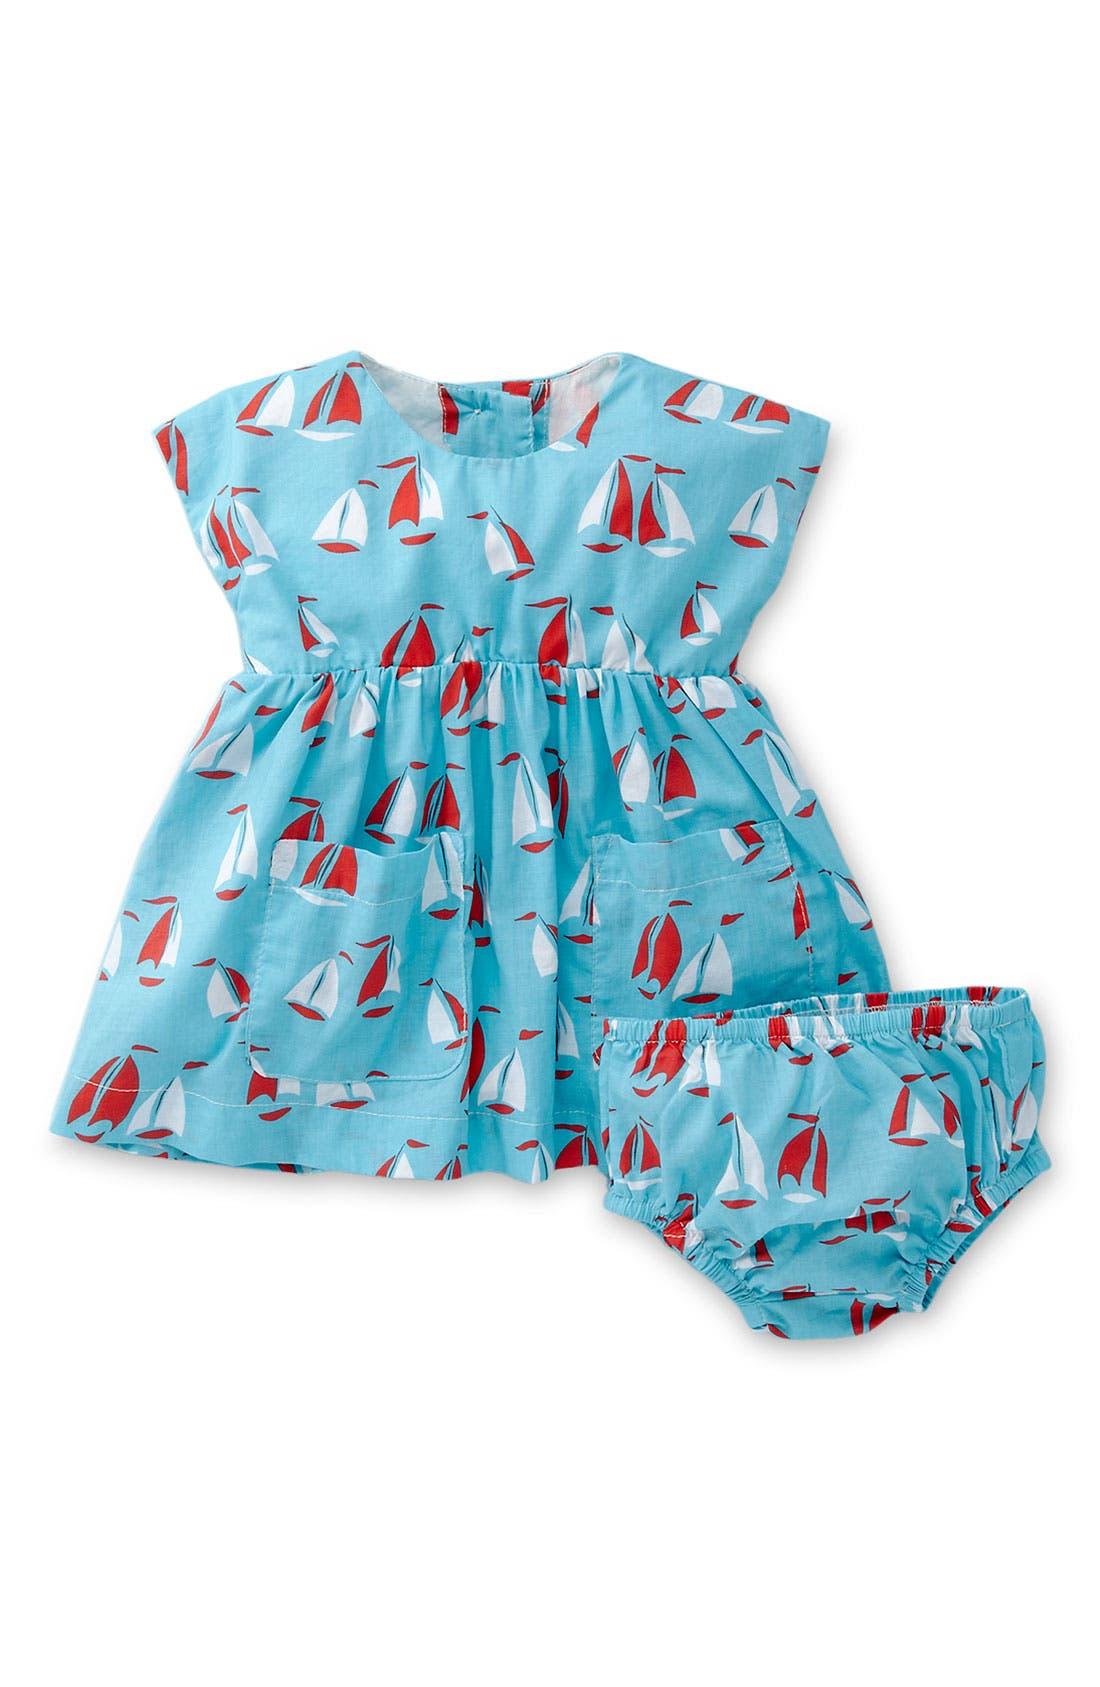 Alternate Image 1 Selected - Mini Boden 'Fifties' Dress (Infant)